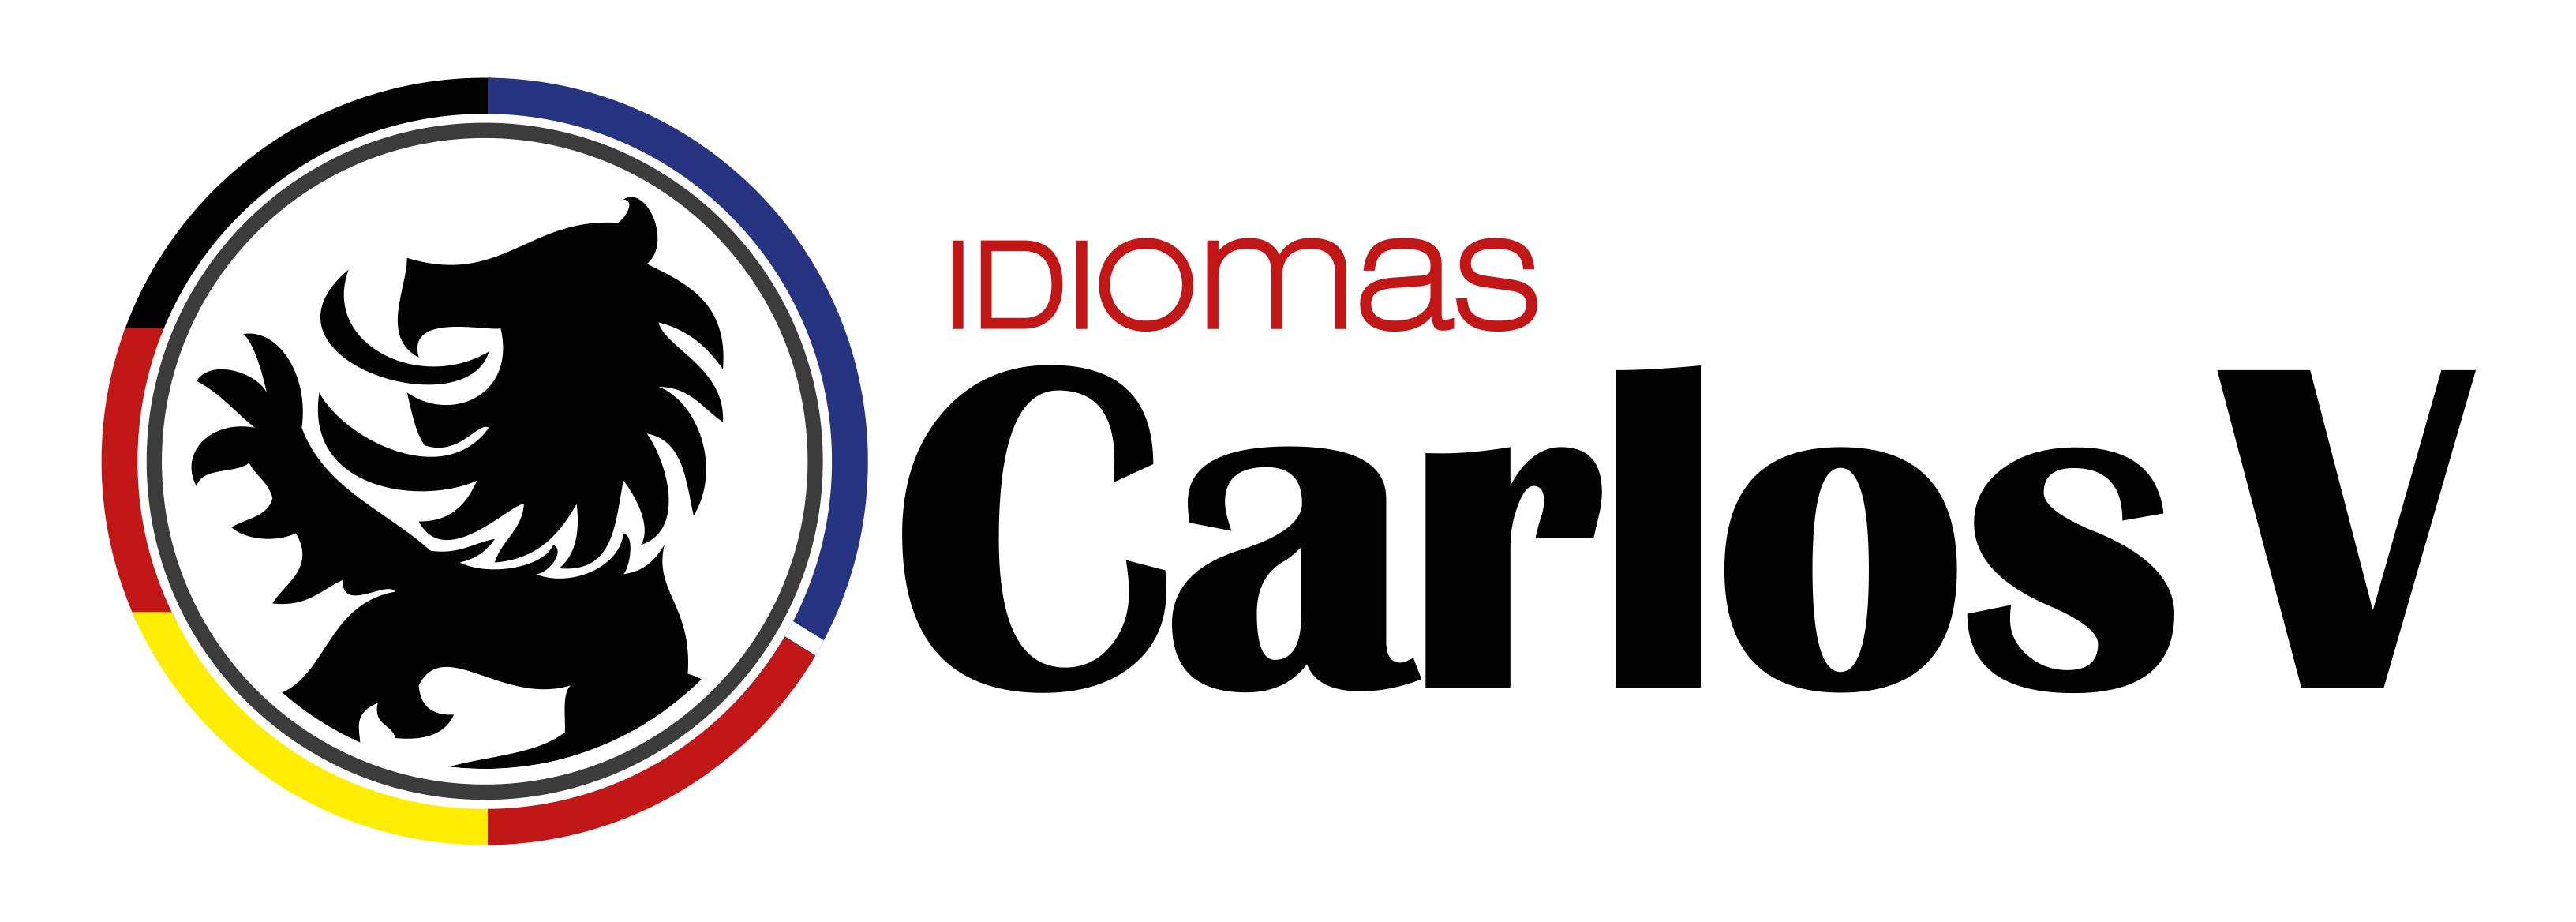 LogoCarlosV Idiomas